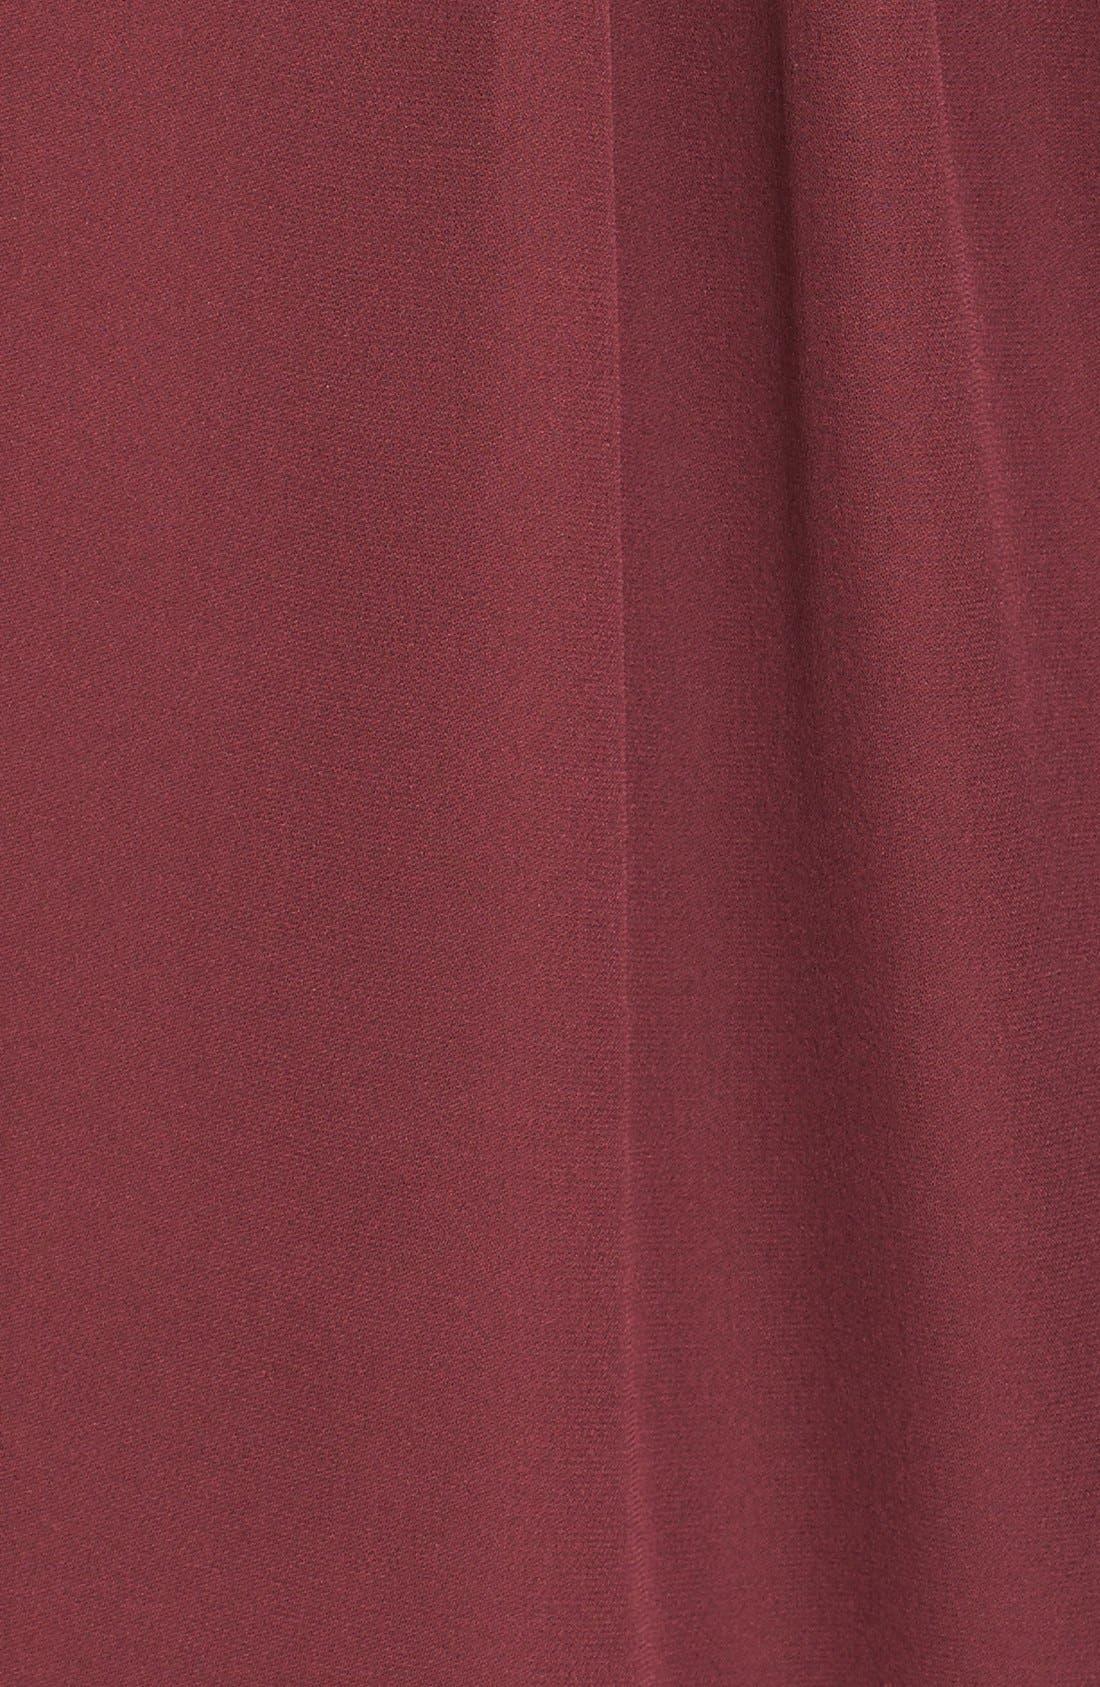 Alternate Image 4  - Joie 'Melisent' Sleeveless Tie Neck Silk Blouse